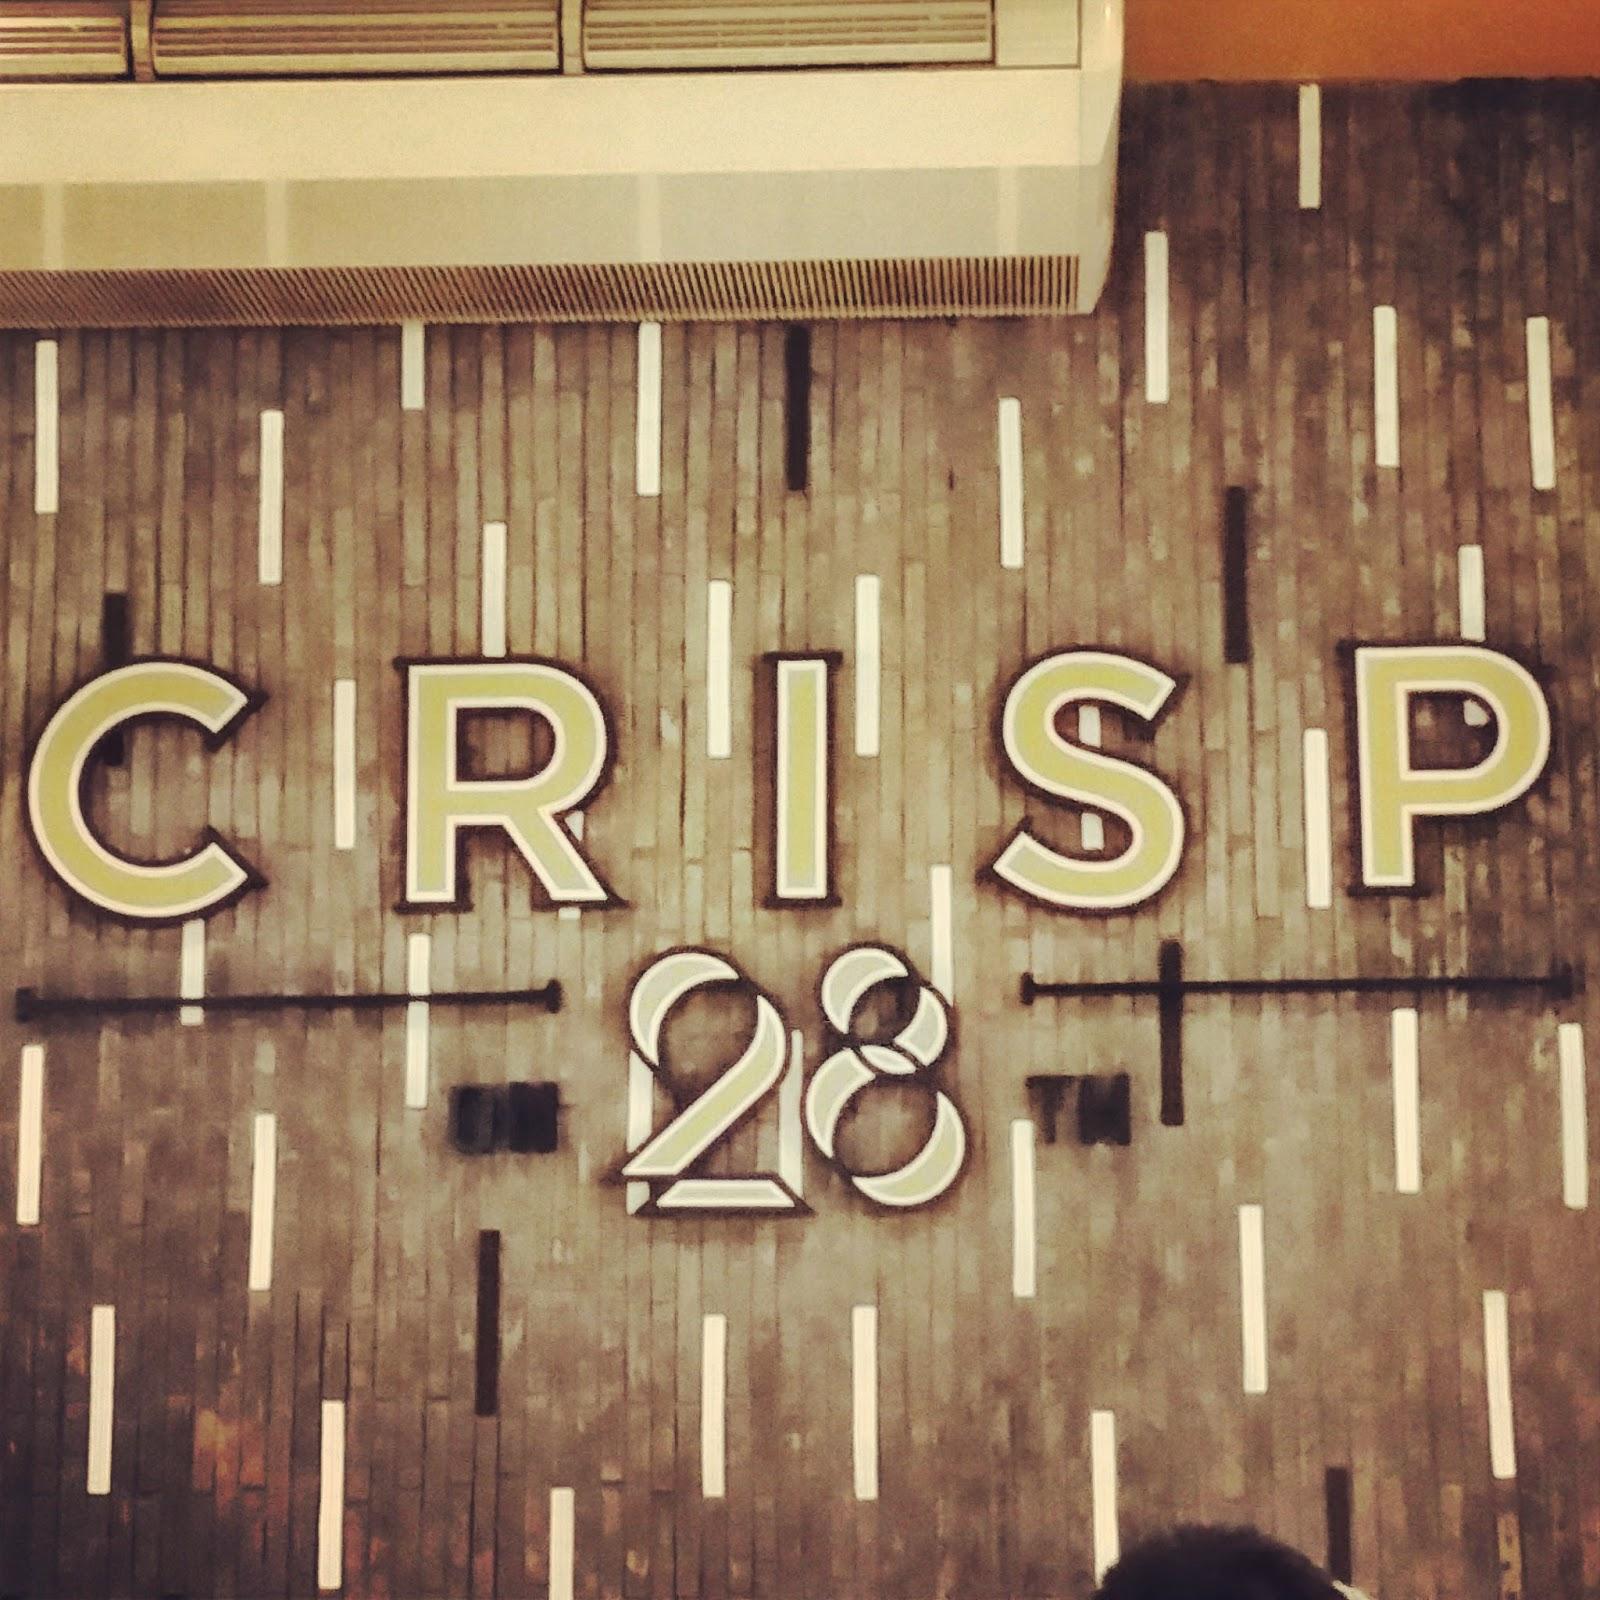 crisp on 28th